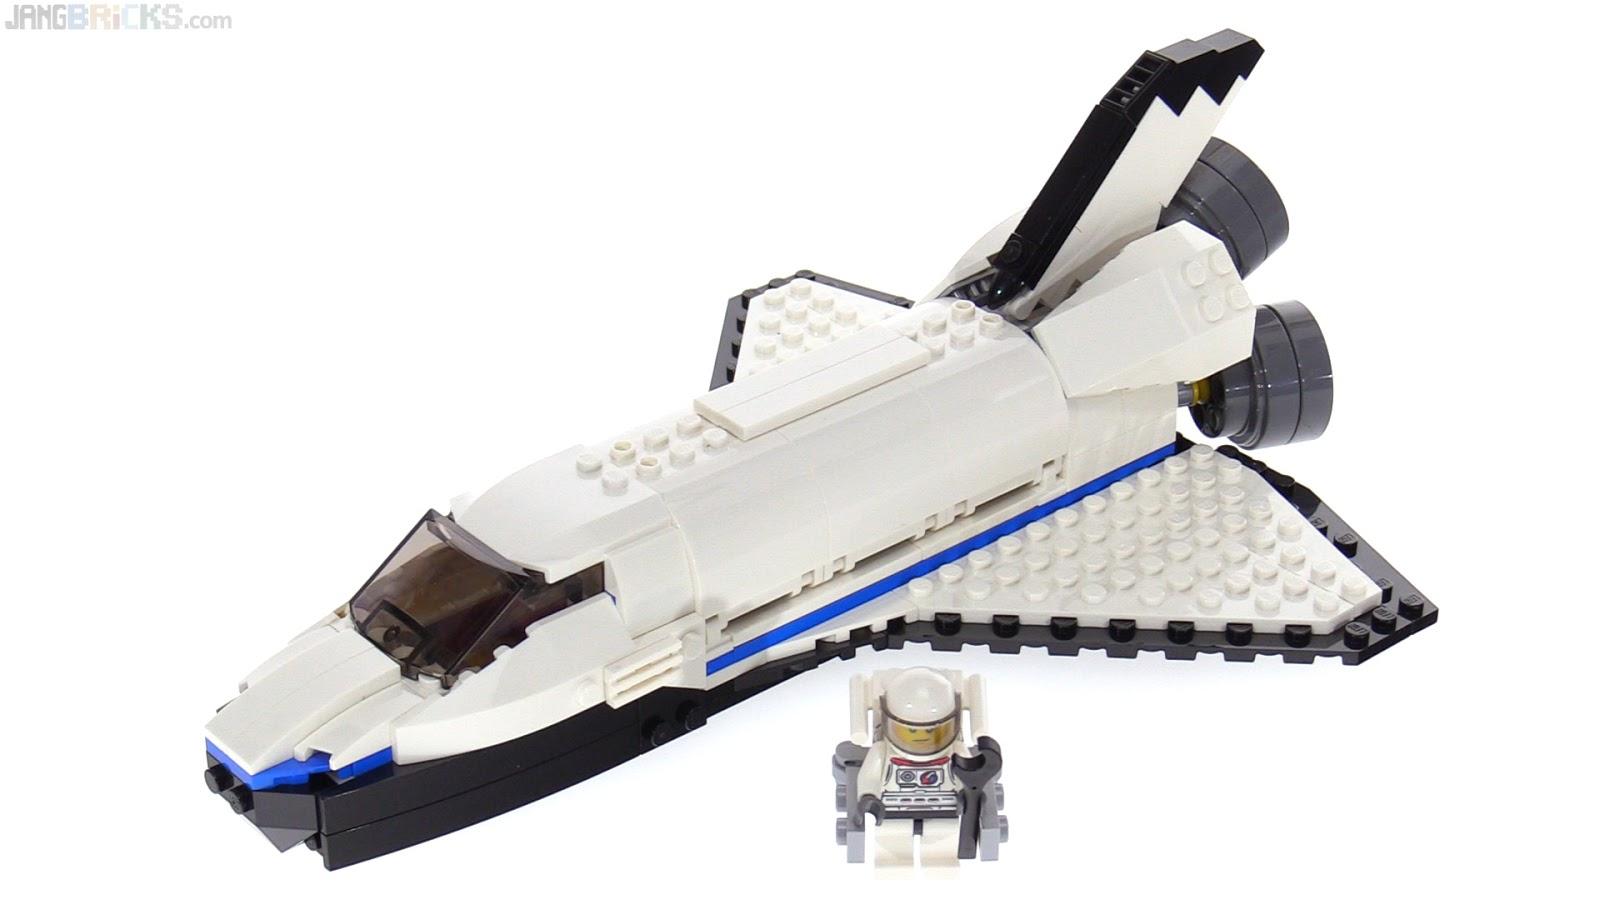 lego duplo space shuttle - photo #21